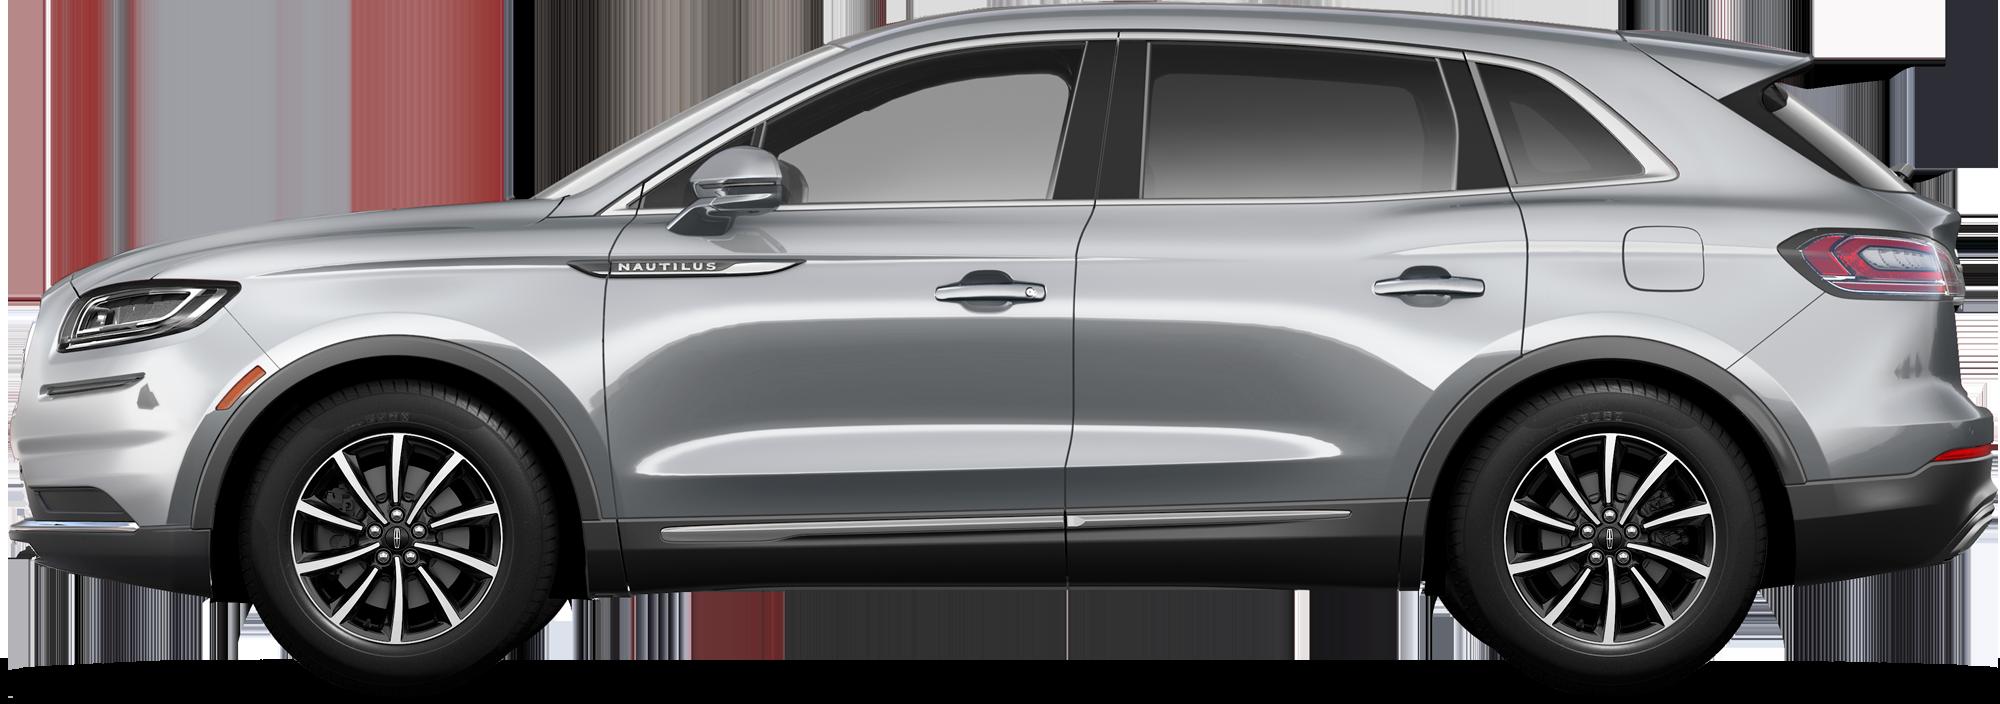 2021 Lincoln Nautilus SUV Standard